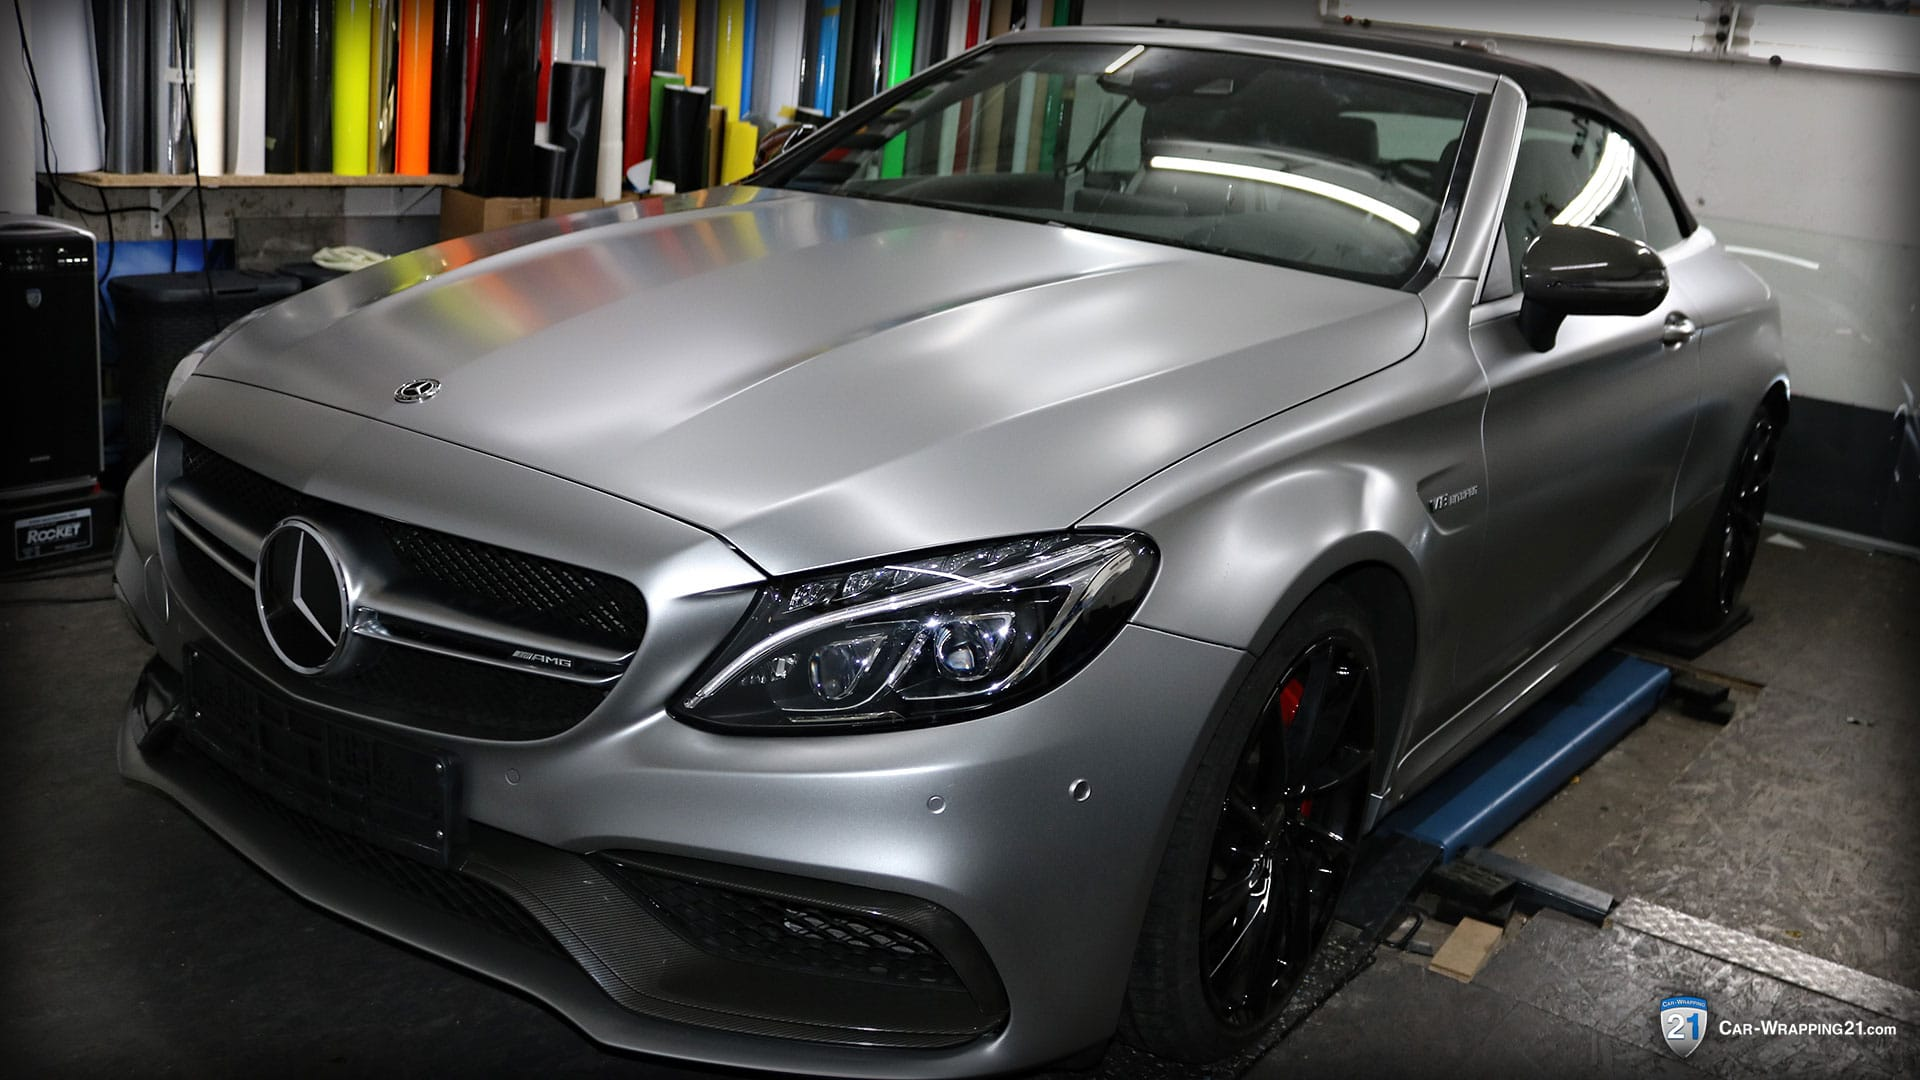 Mercedes-Benz-C63-Amg-Vollfolierung-Avery-Satin-Metallic-Light-Grey-Nachher-V8-Cabrio-2016